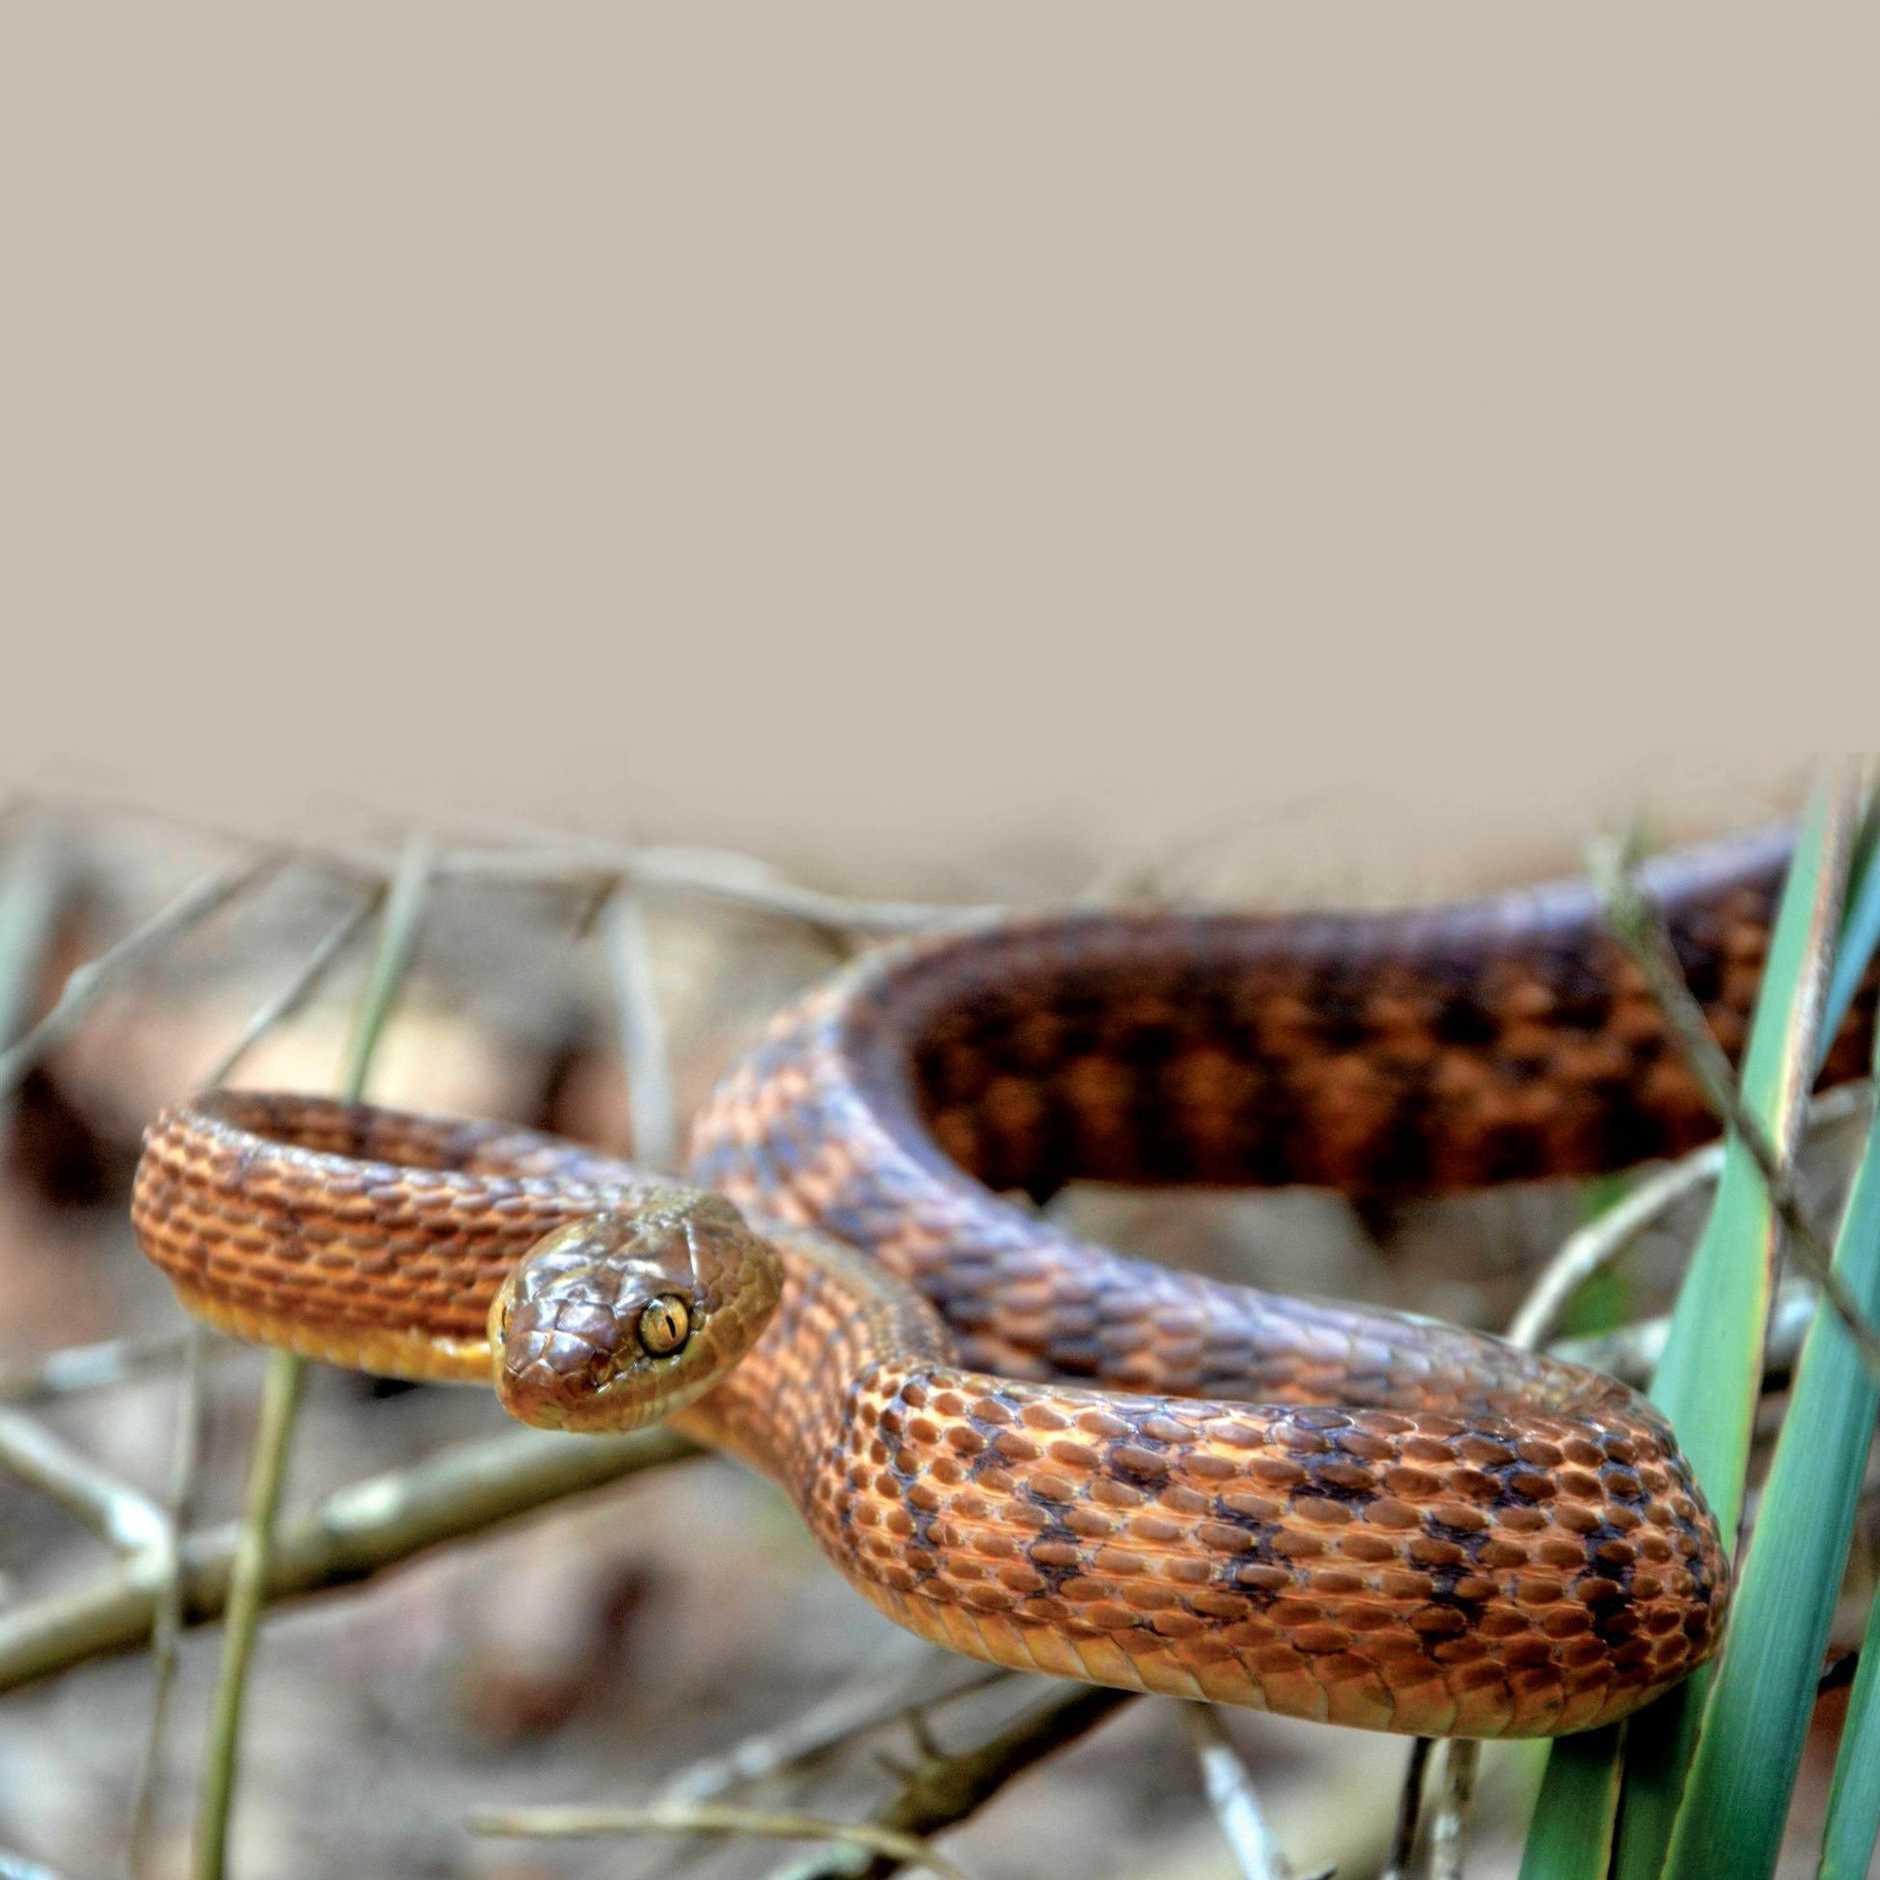 Brown Tree Snake. Photo Richie Gilbert